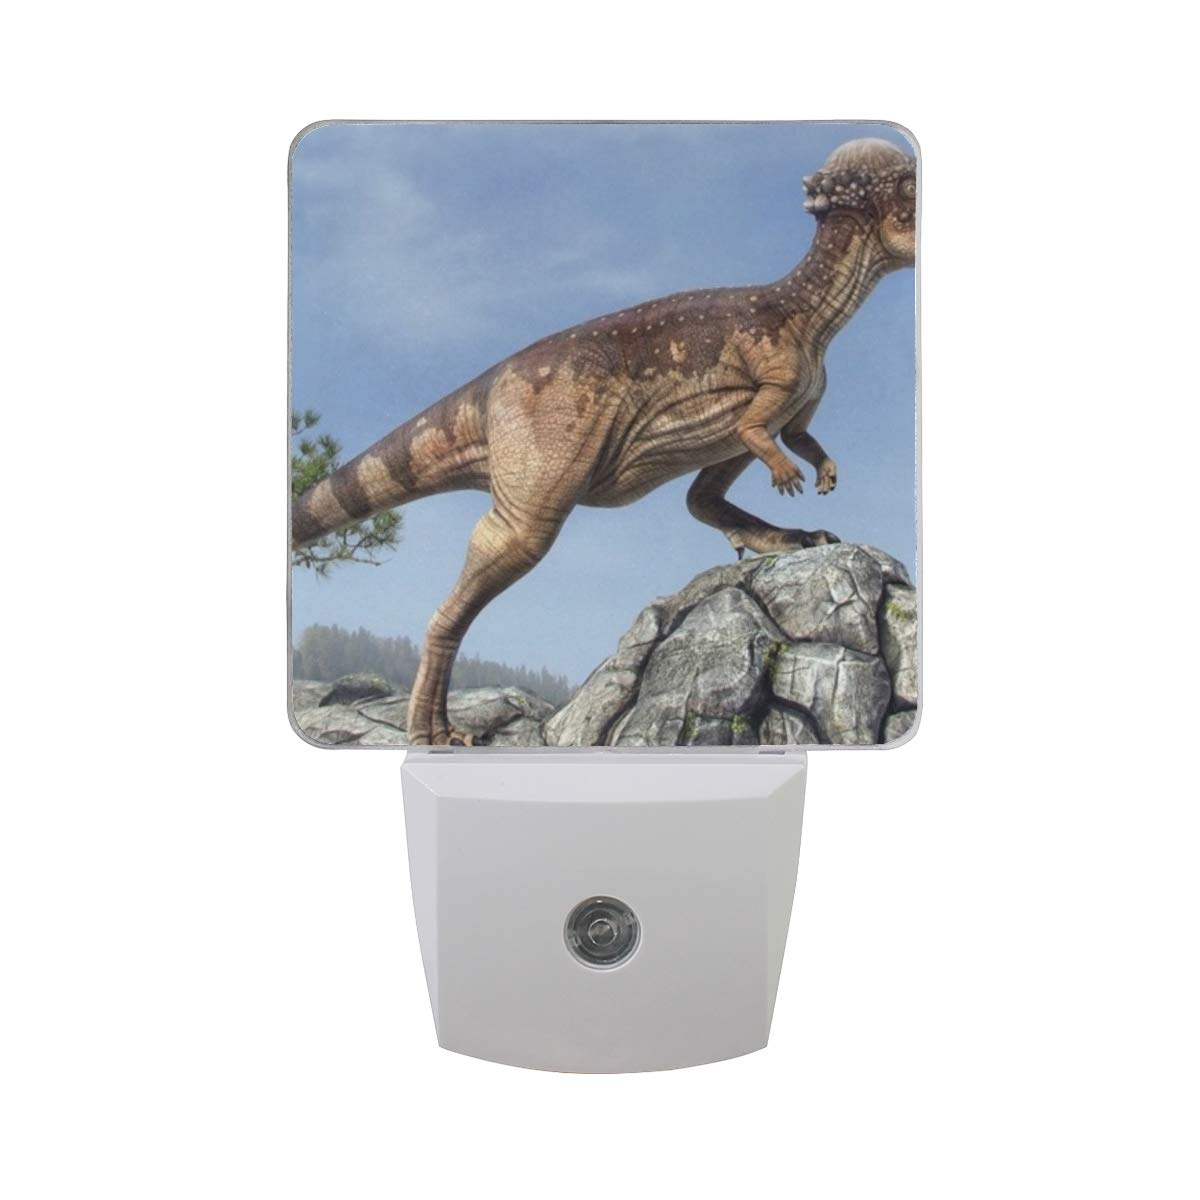 Night Light Dinosaur Tree Rocks Sky Led Light Lamp for Hallway, Kitchen, Bathroom, Bedroom, Stairs, DaylightWhite, Bedroom, Compact